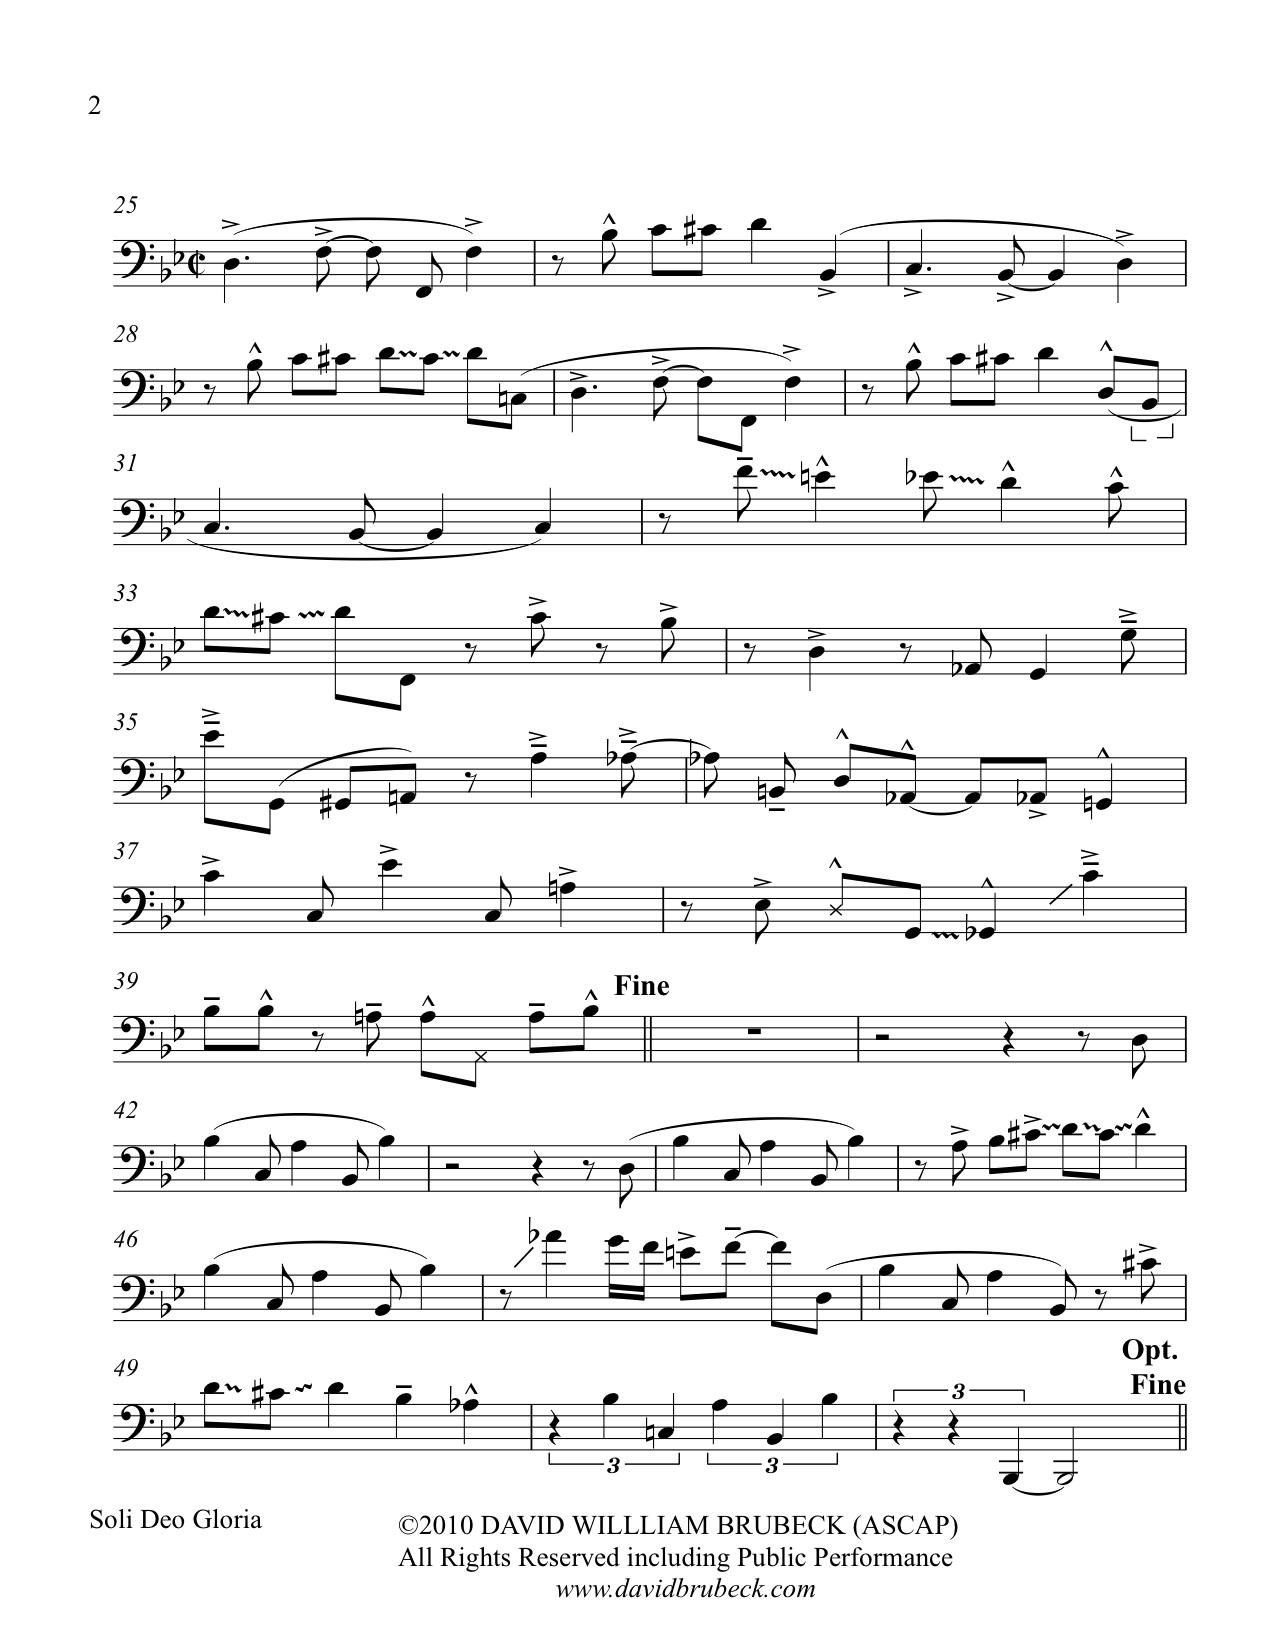 Stereo No.  37 A page 2